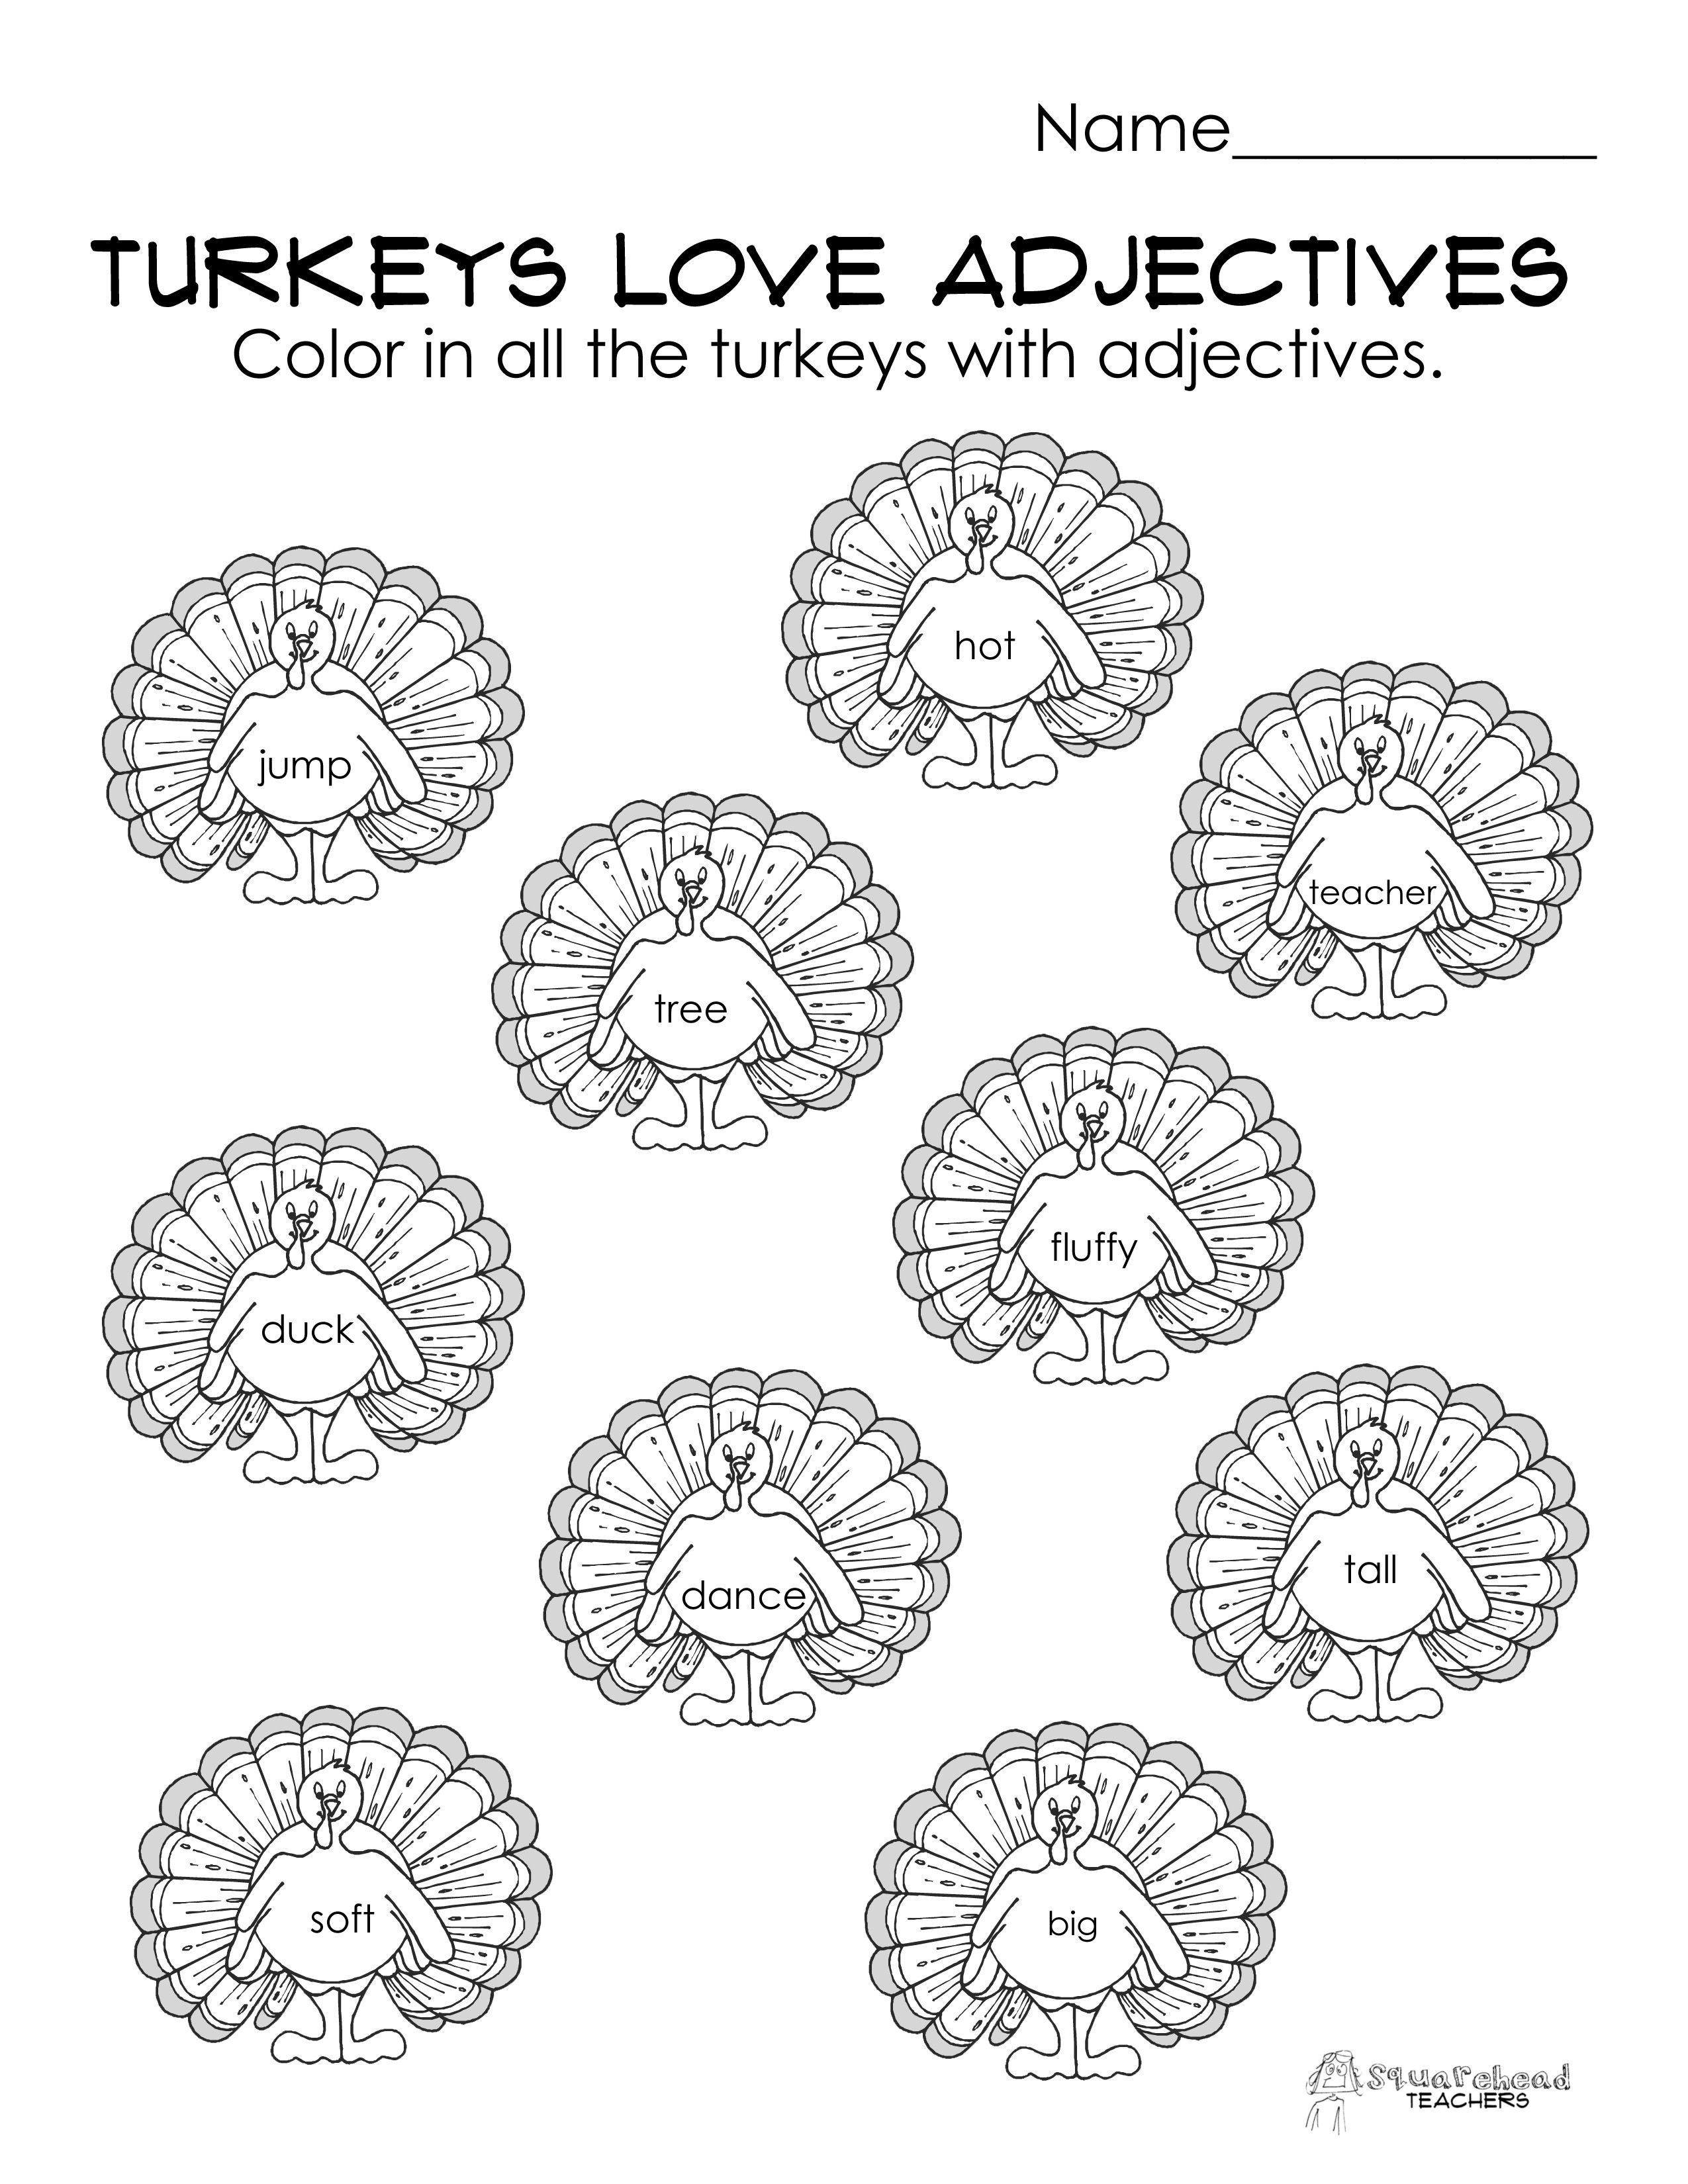 Turkeys Love Adjectives Worksheet